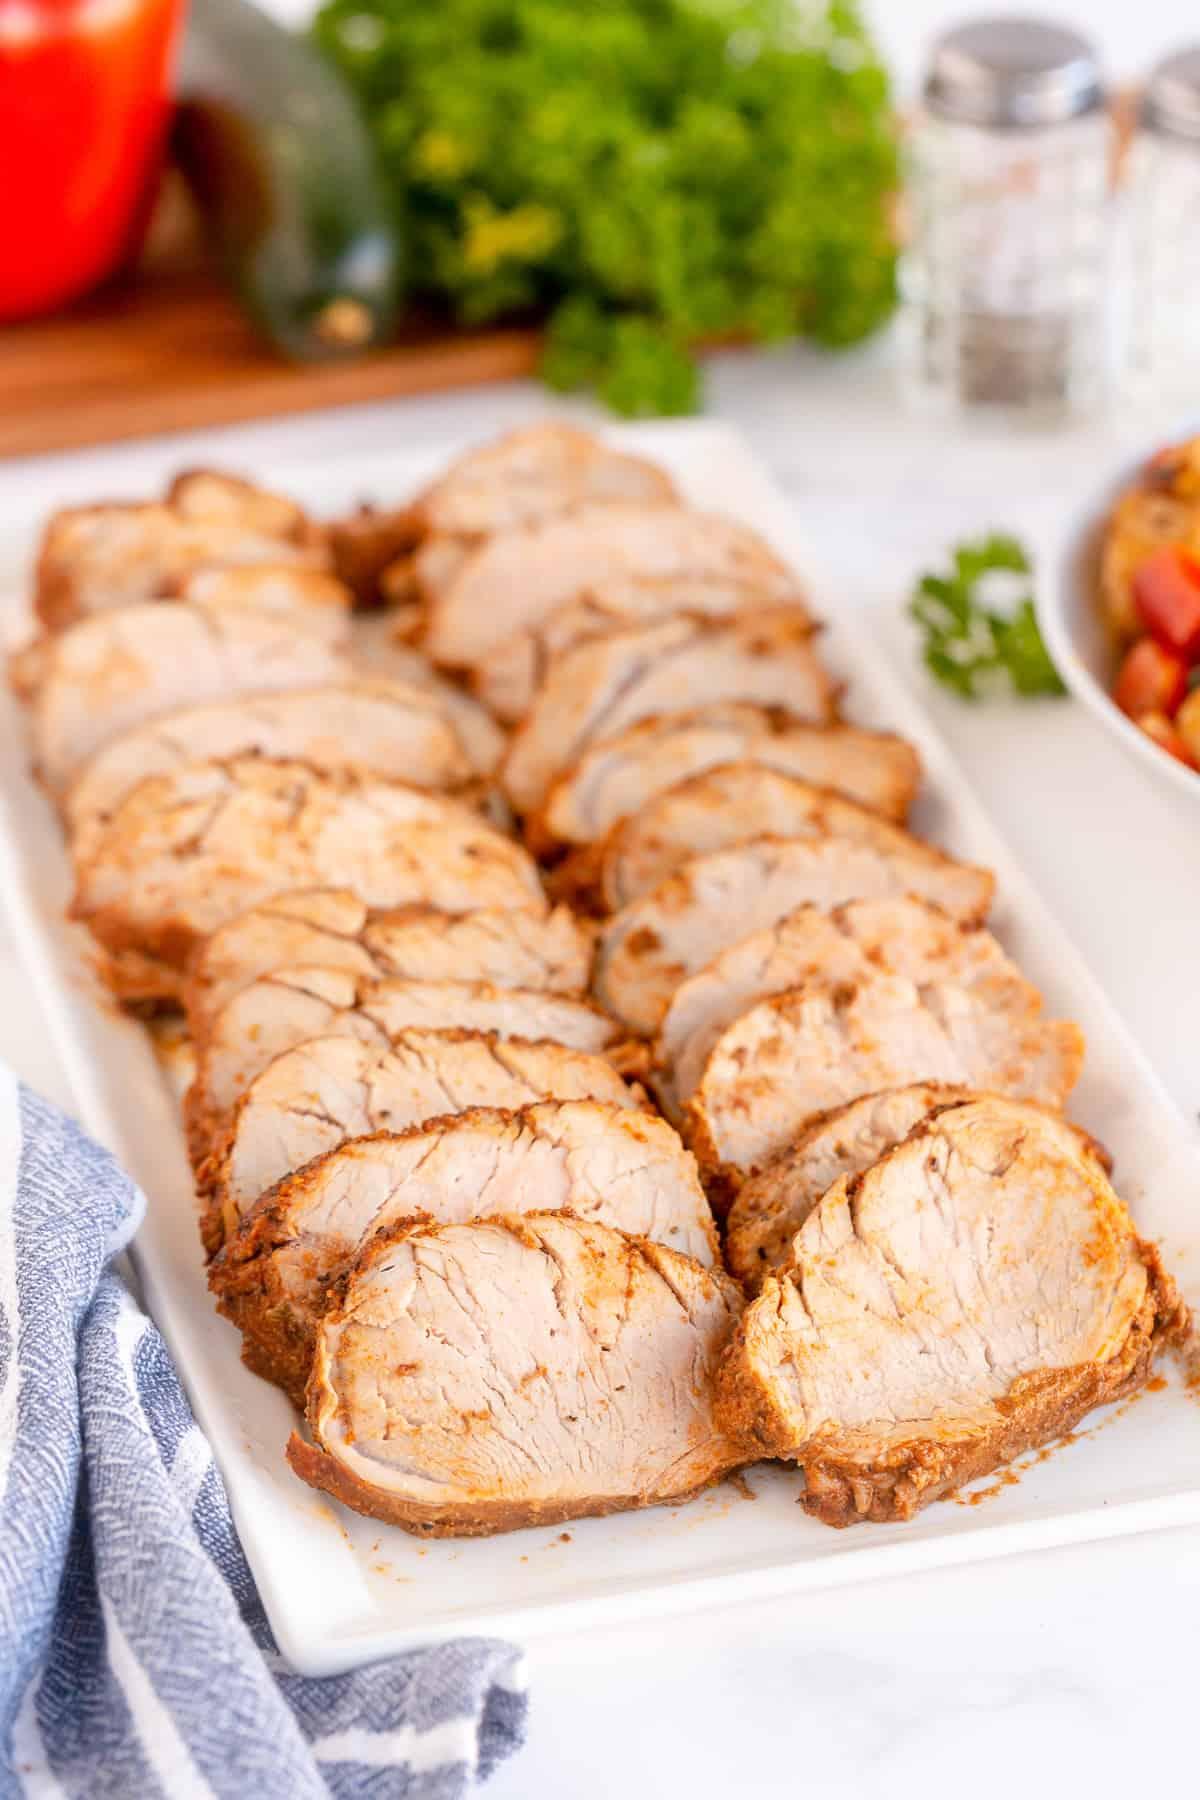 Sliced pork tenderloin on a serving platter.